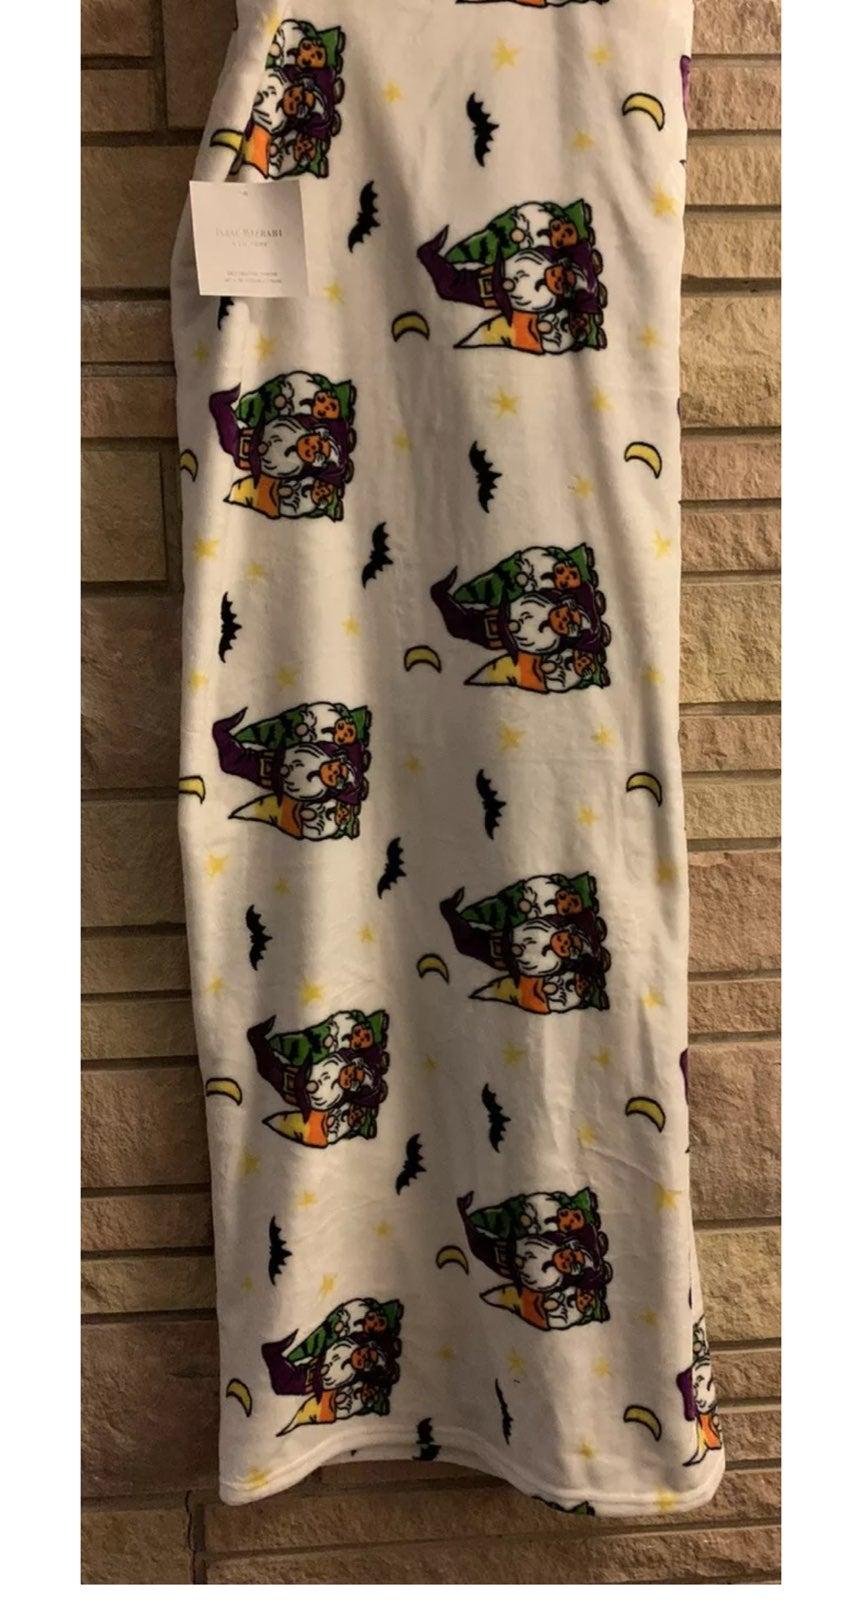 Isaac Mizrahi Decorative Throw Ultra Plush Blanket 60x70 Gnomes Halloween Soft